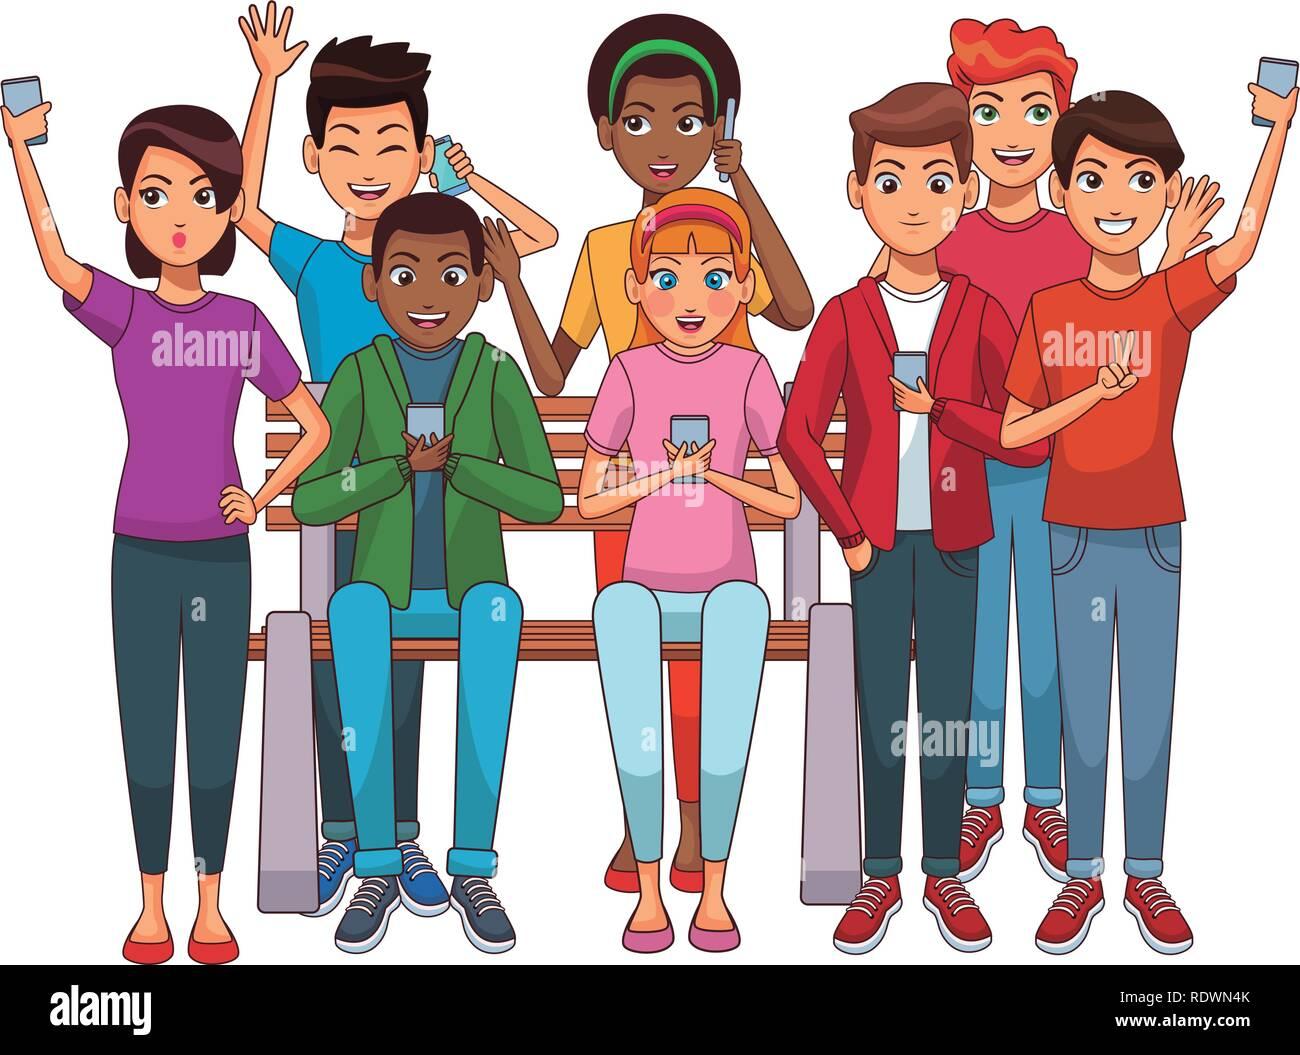 Group Of Friends Cartoon Stock Vector Art Amp Illustration